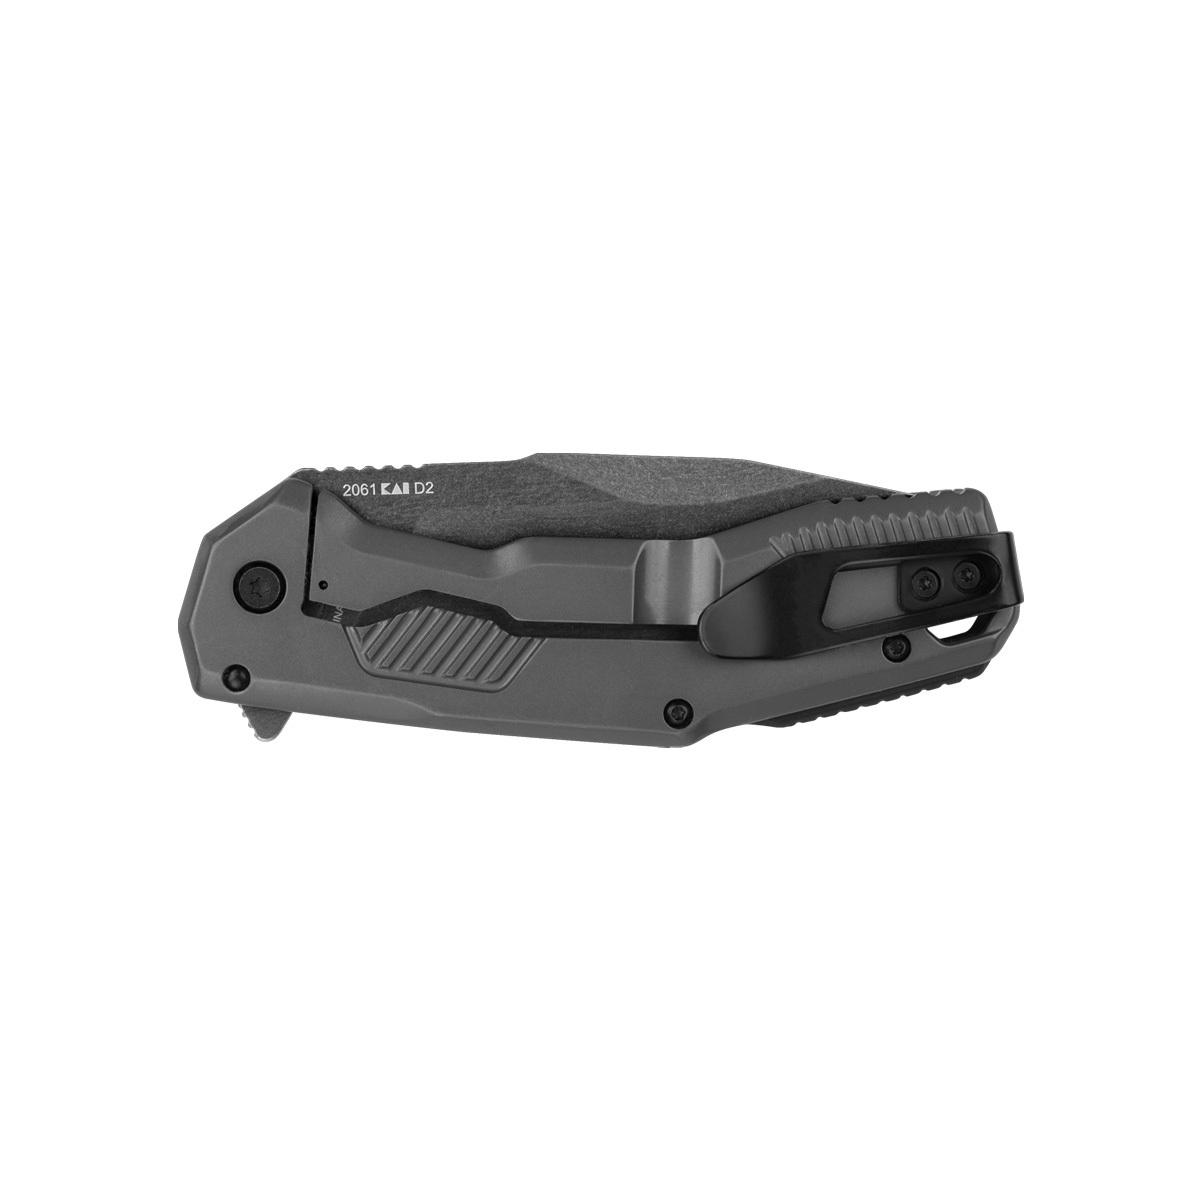 Складной нож Kershaw Cannonball модель 2061 полуавтомат   Wenger-Victorinox.Ru